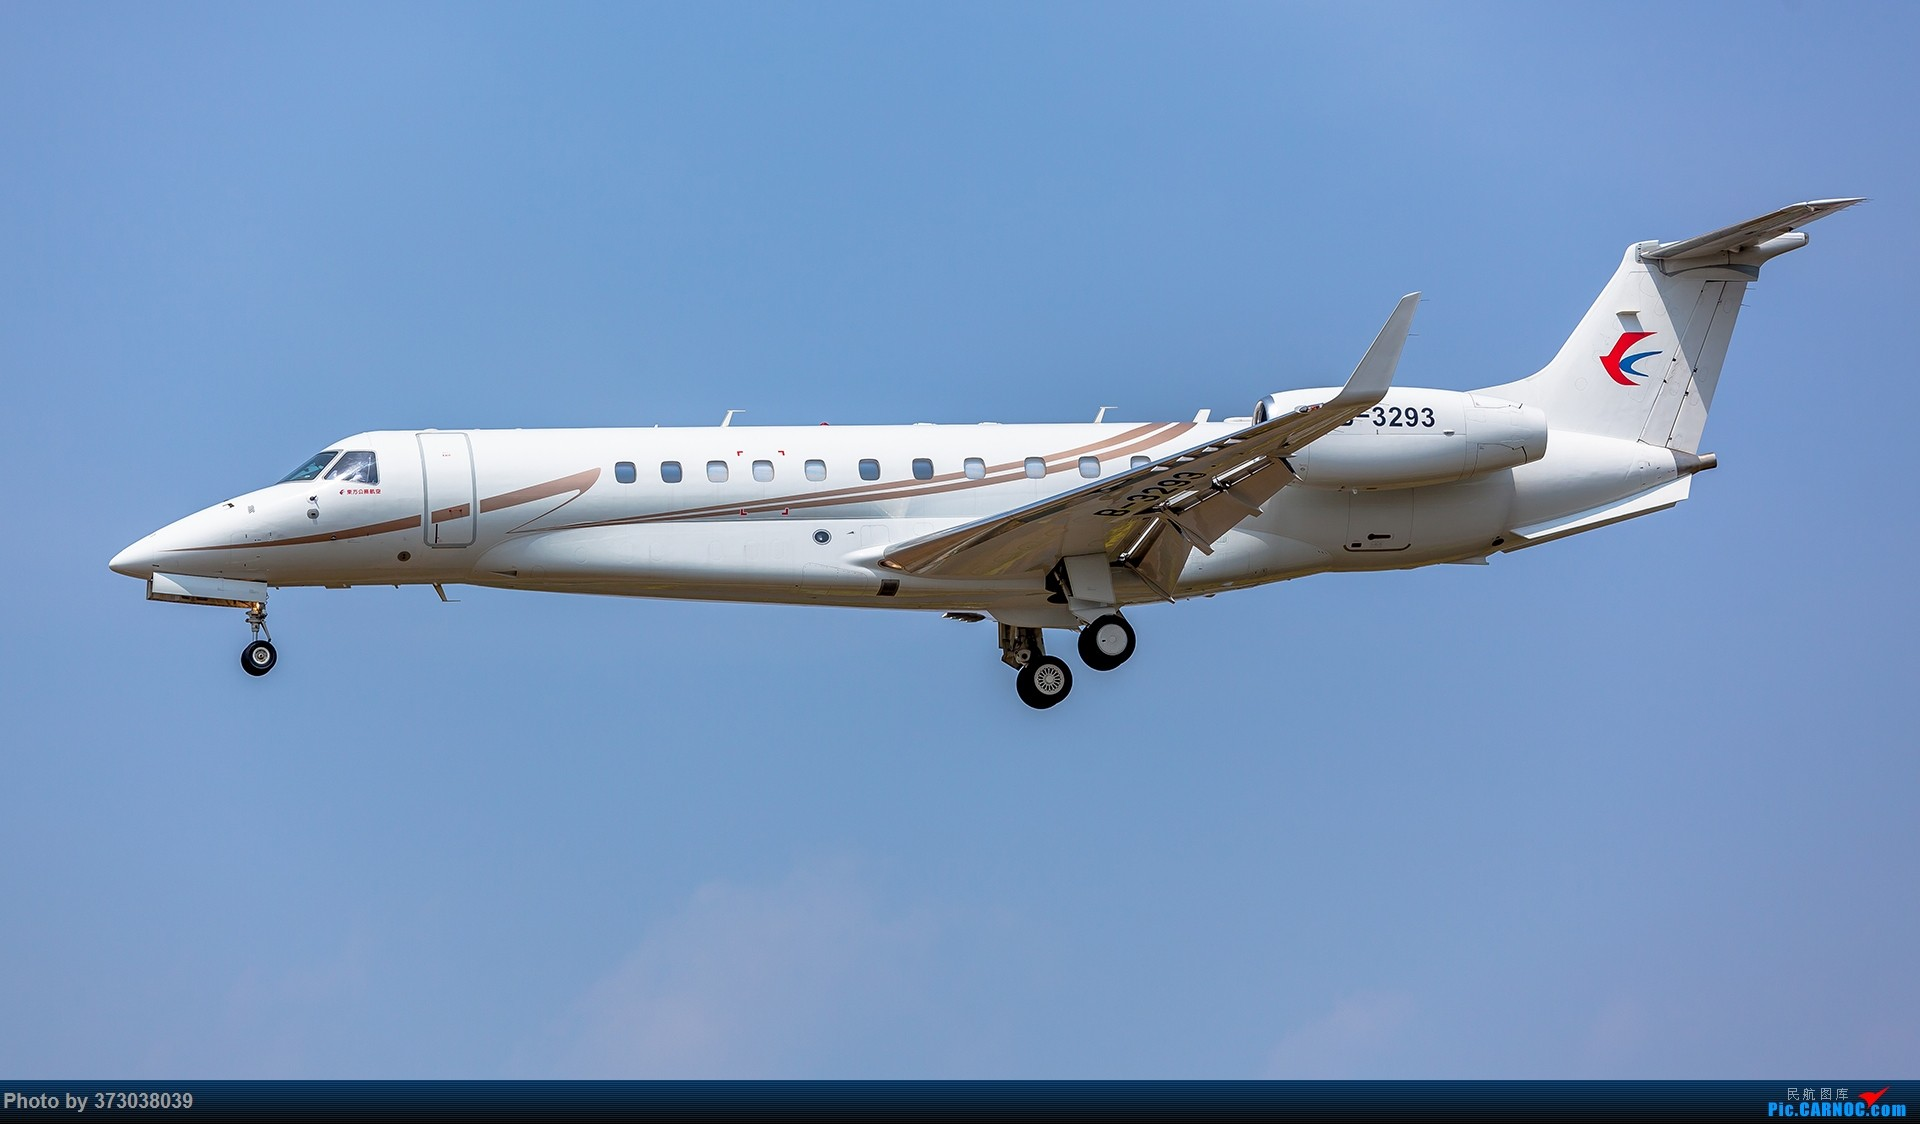 Re:[原创]HGH杭州萧山国际机场 落地的 公务机大佬们 湾流 EMBRAER LEGACY 650 B-3293 中国杭州萧山国际机场